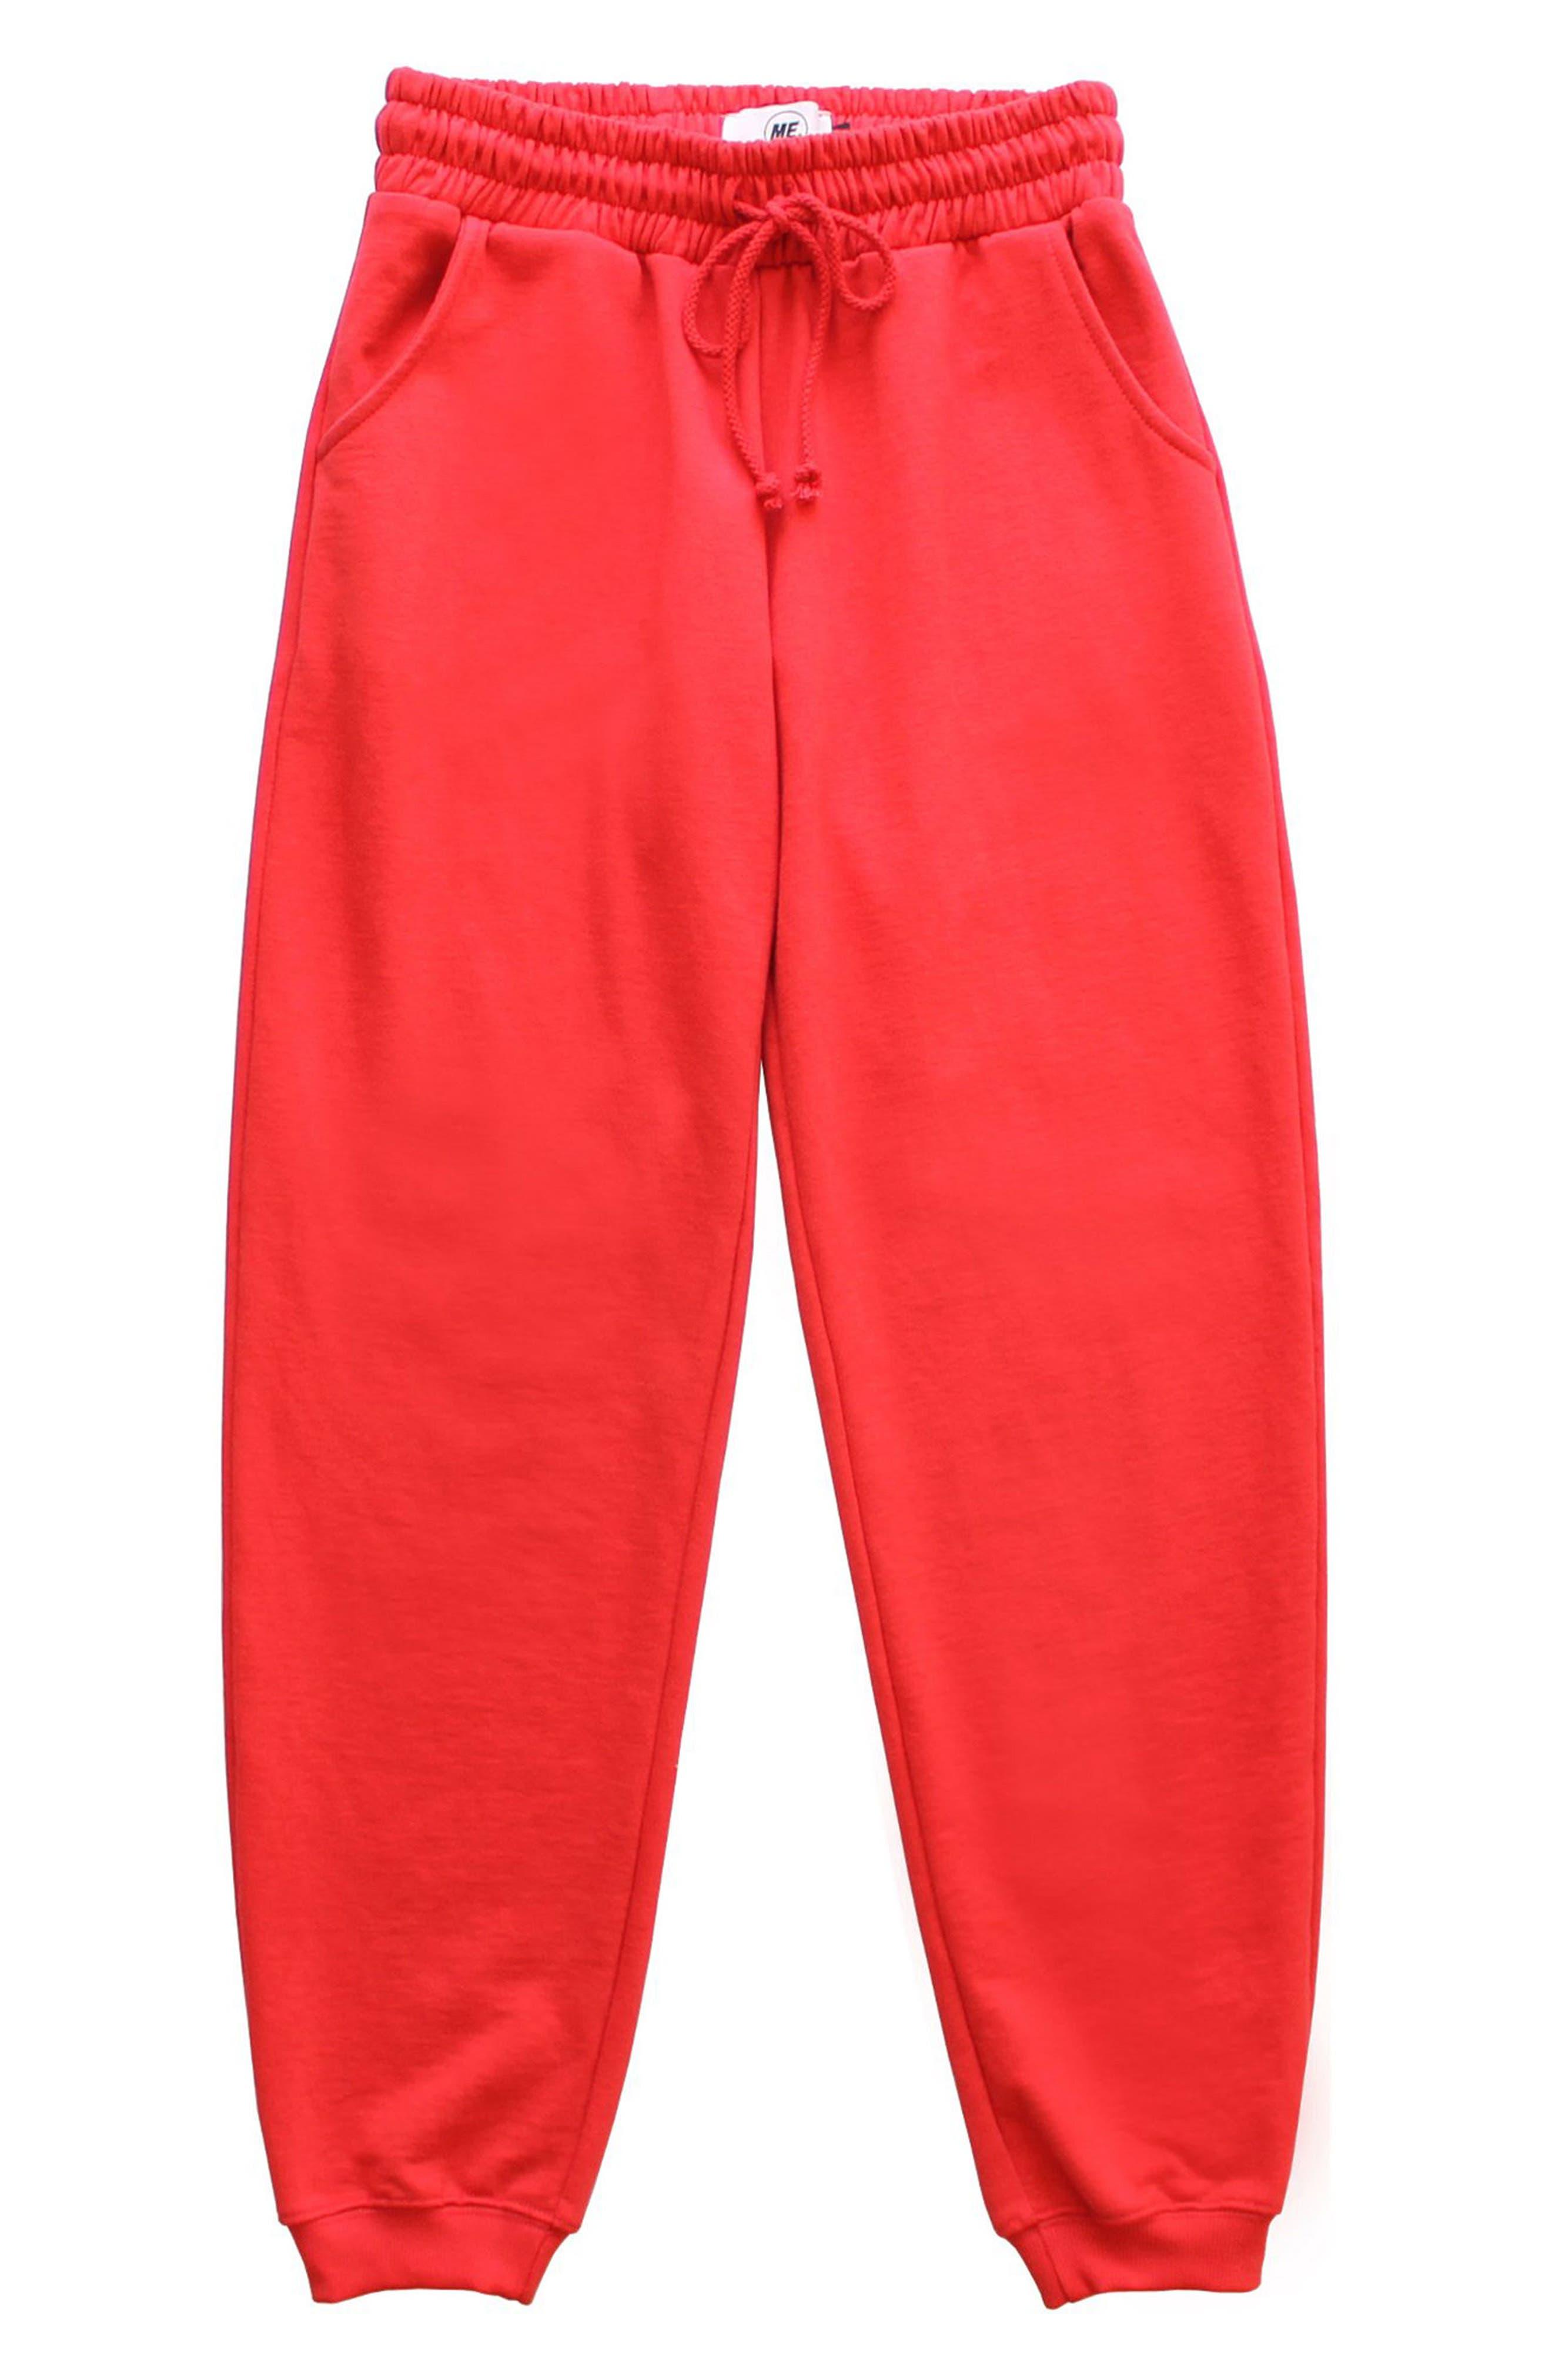 ME. Rose Sweatpants,                             Main thumbnail 1, color,                             CHERRY RED